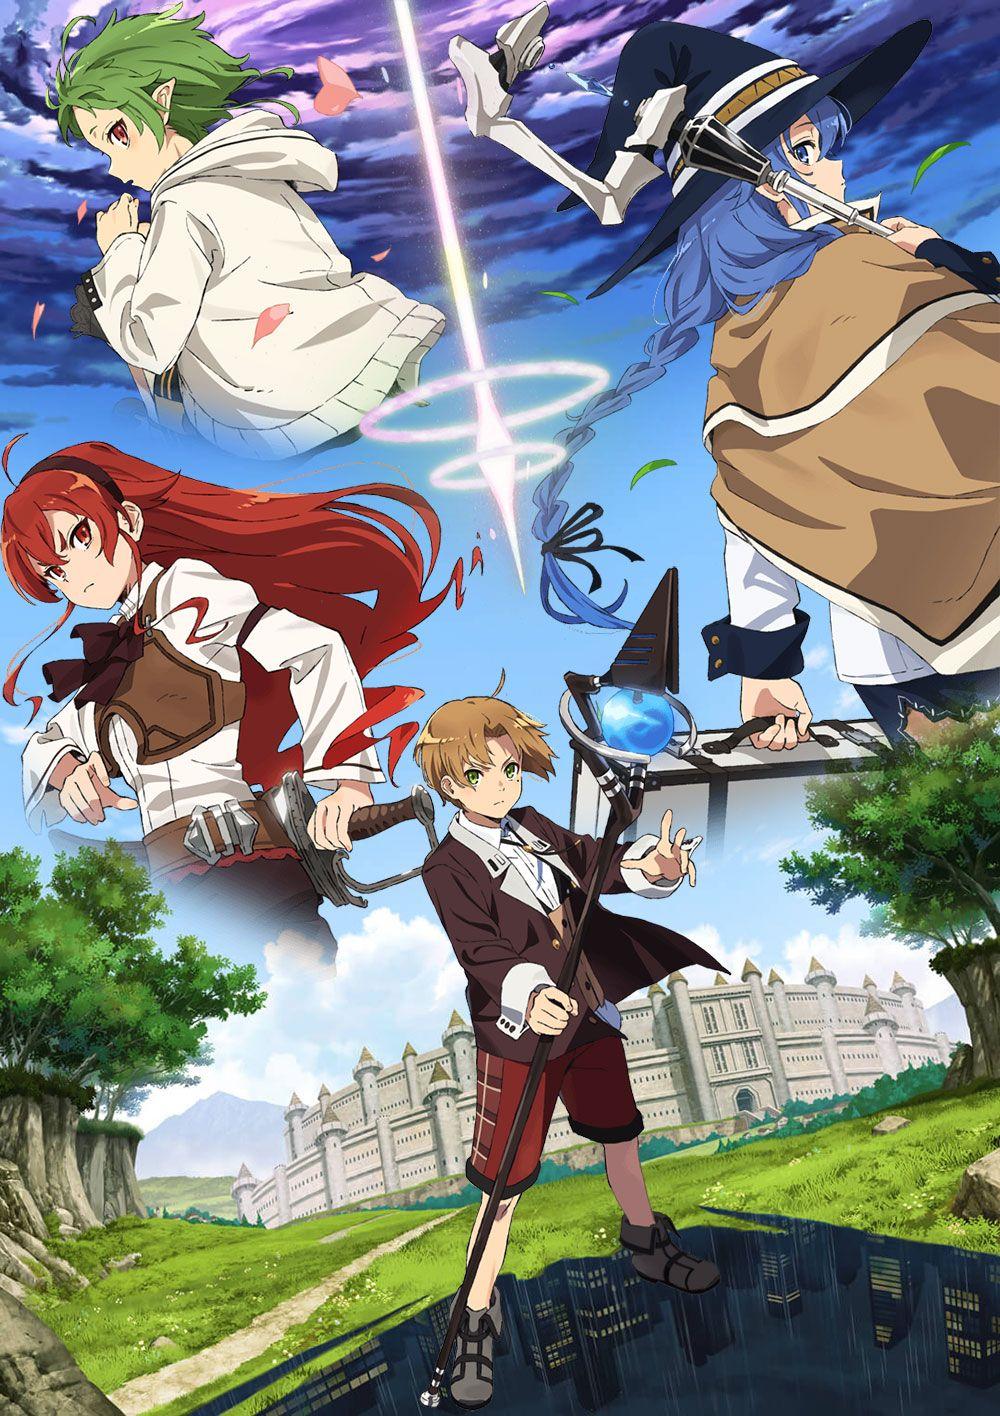 Roxy Migurdia Mushoku Tensei Wallpaper HD 4k